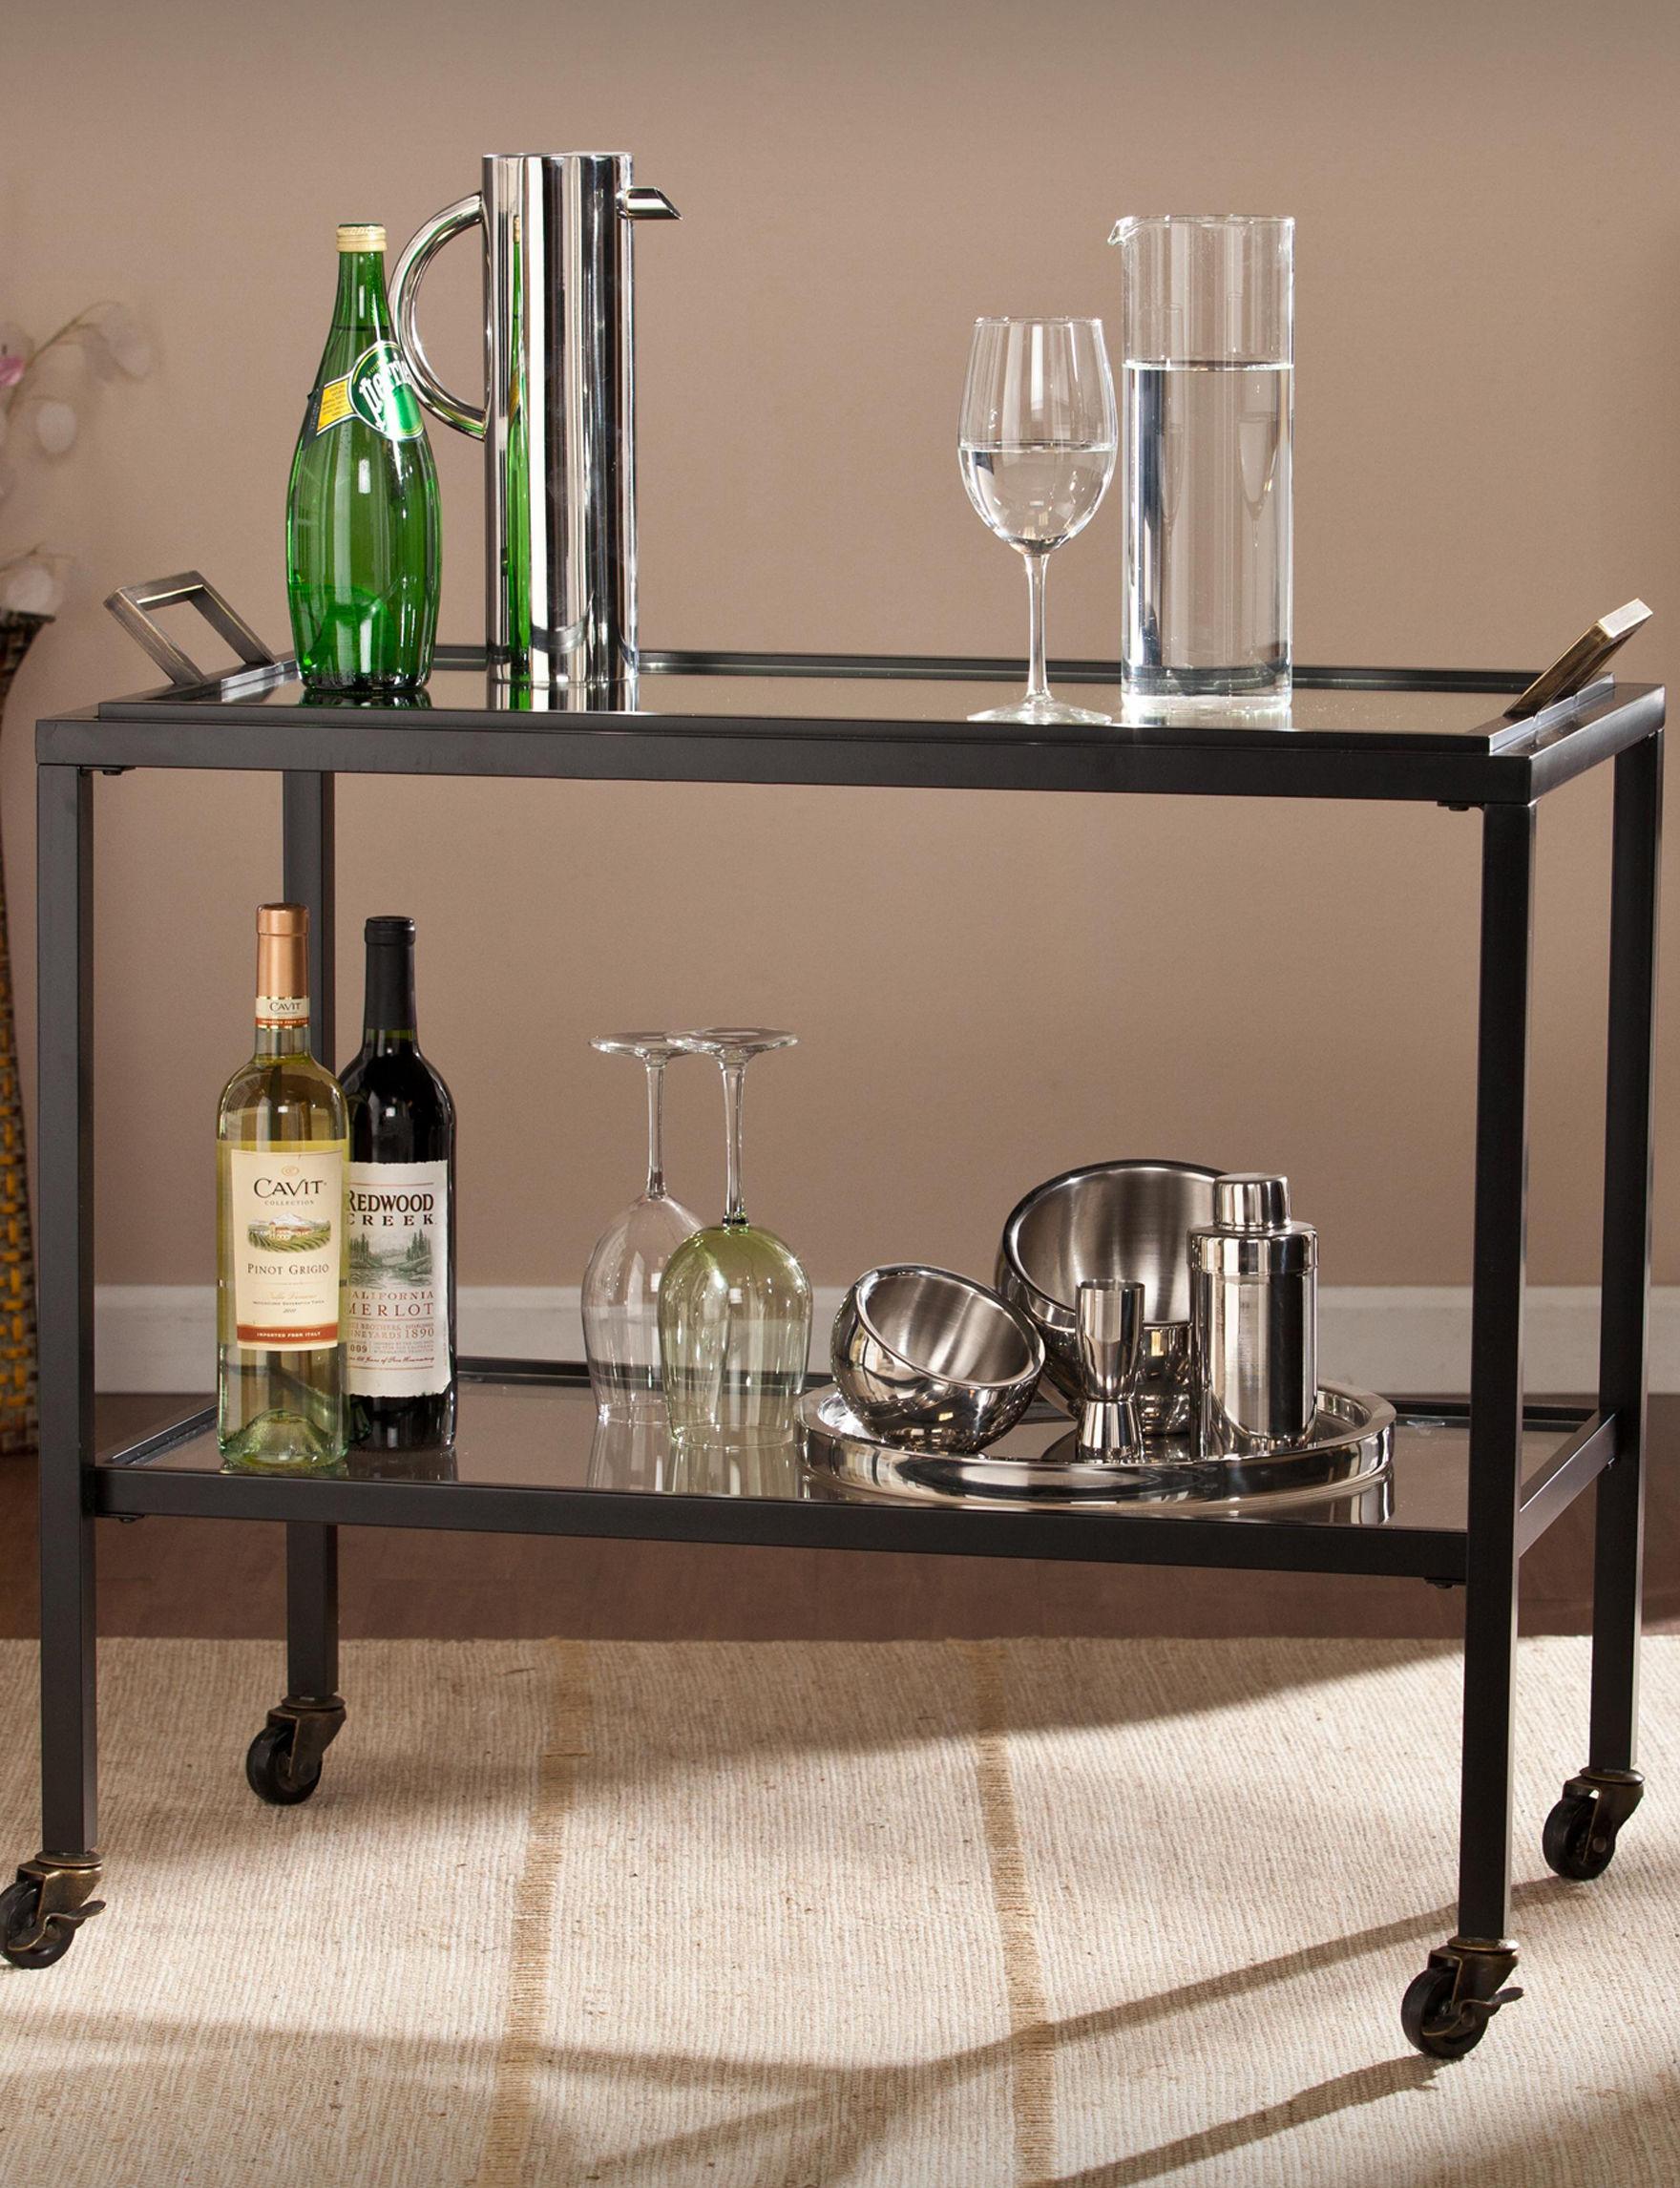 Southern Enterprises Black Bar & Wine Storage Home Accents Kitchen & Dining Furniture